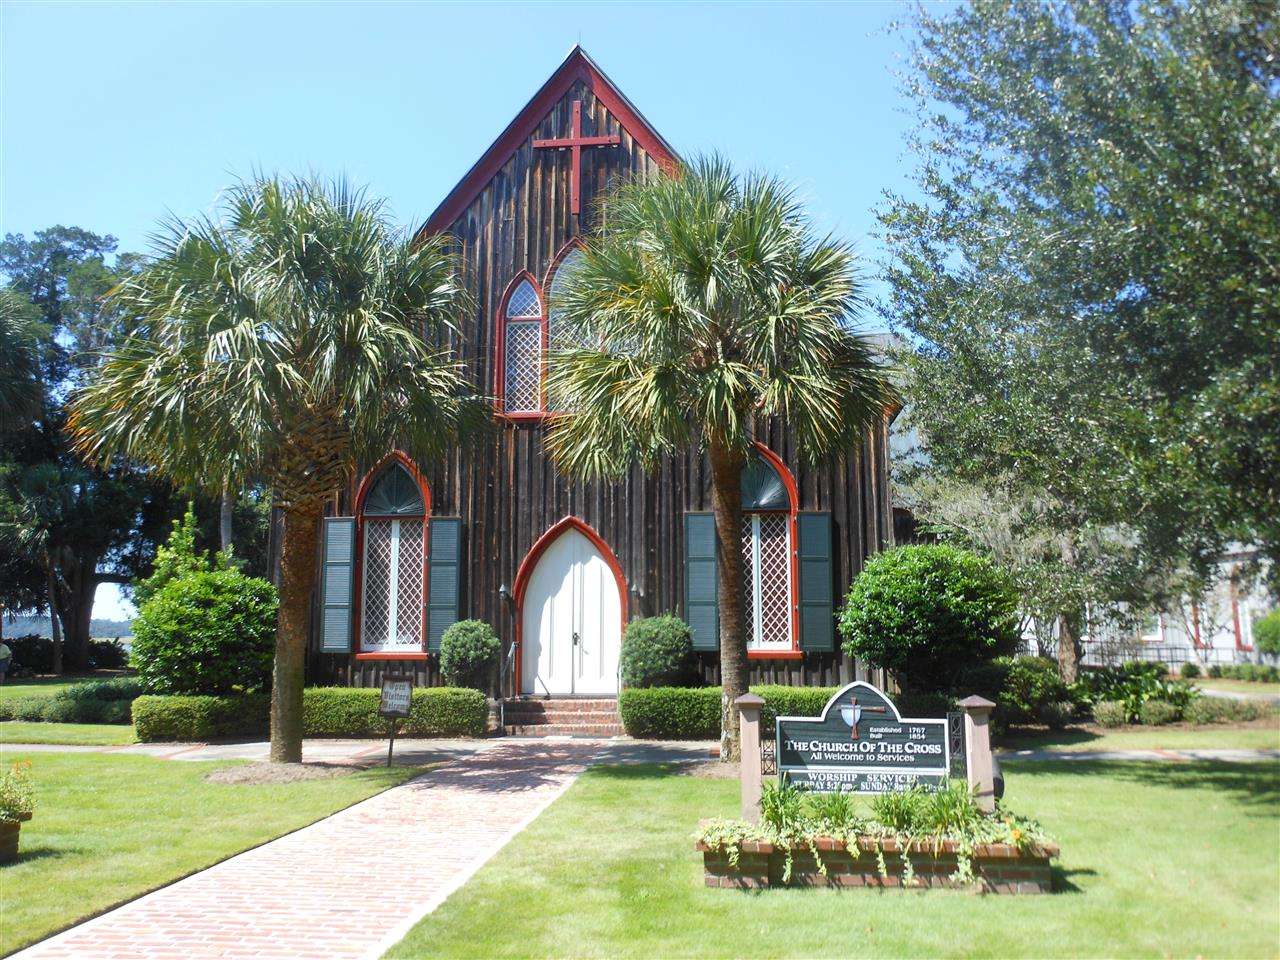 Bluffton / Hilton Head Island SC, beautiful and historic Cross Church in Bluffton